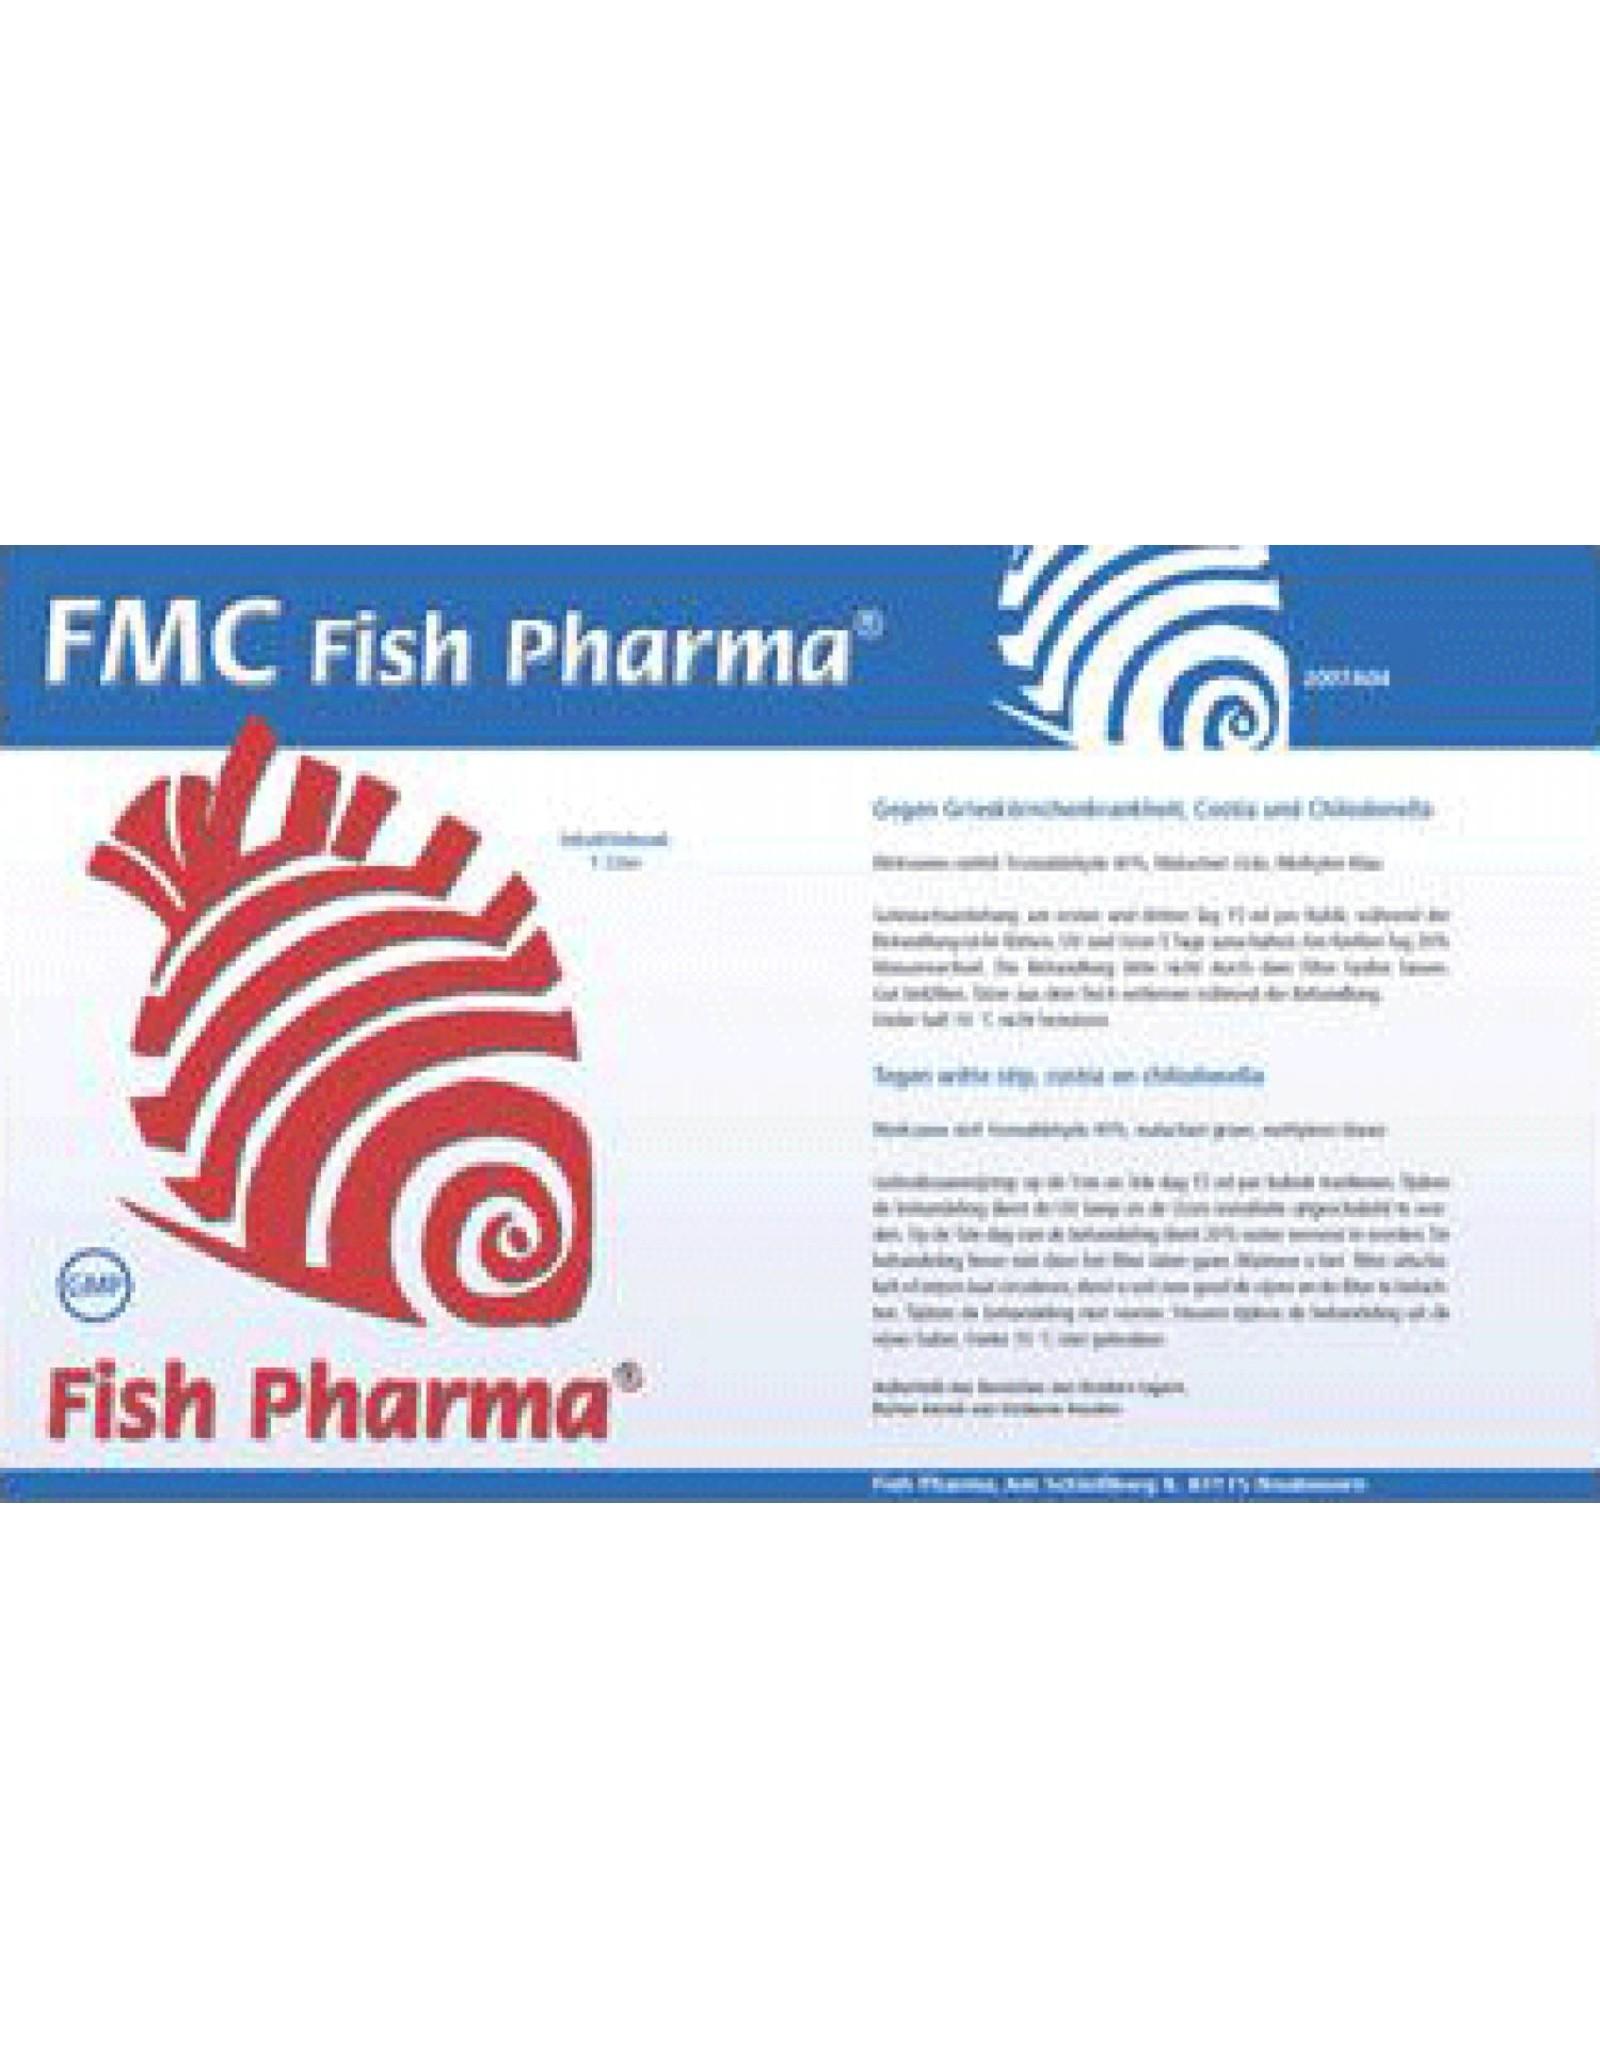 Fish Pharma Fish Pharma FMC tegen witte stip, costia en chilodonella.